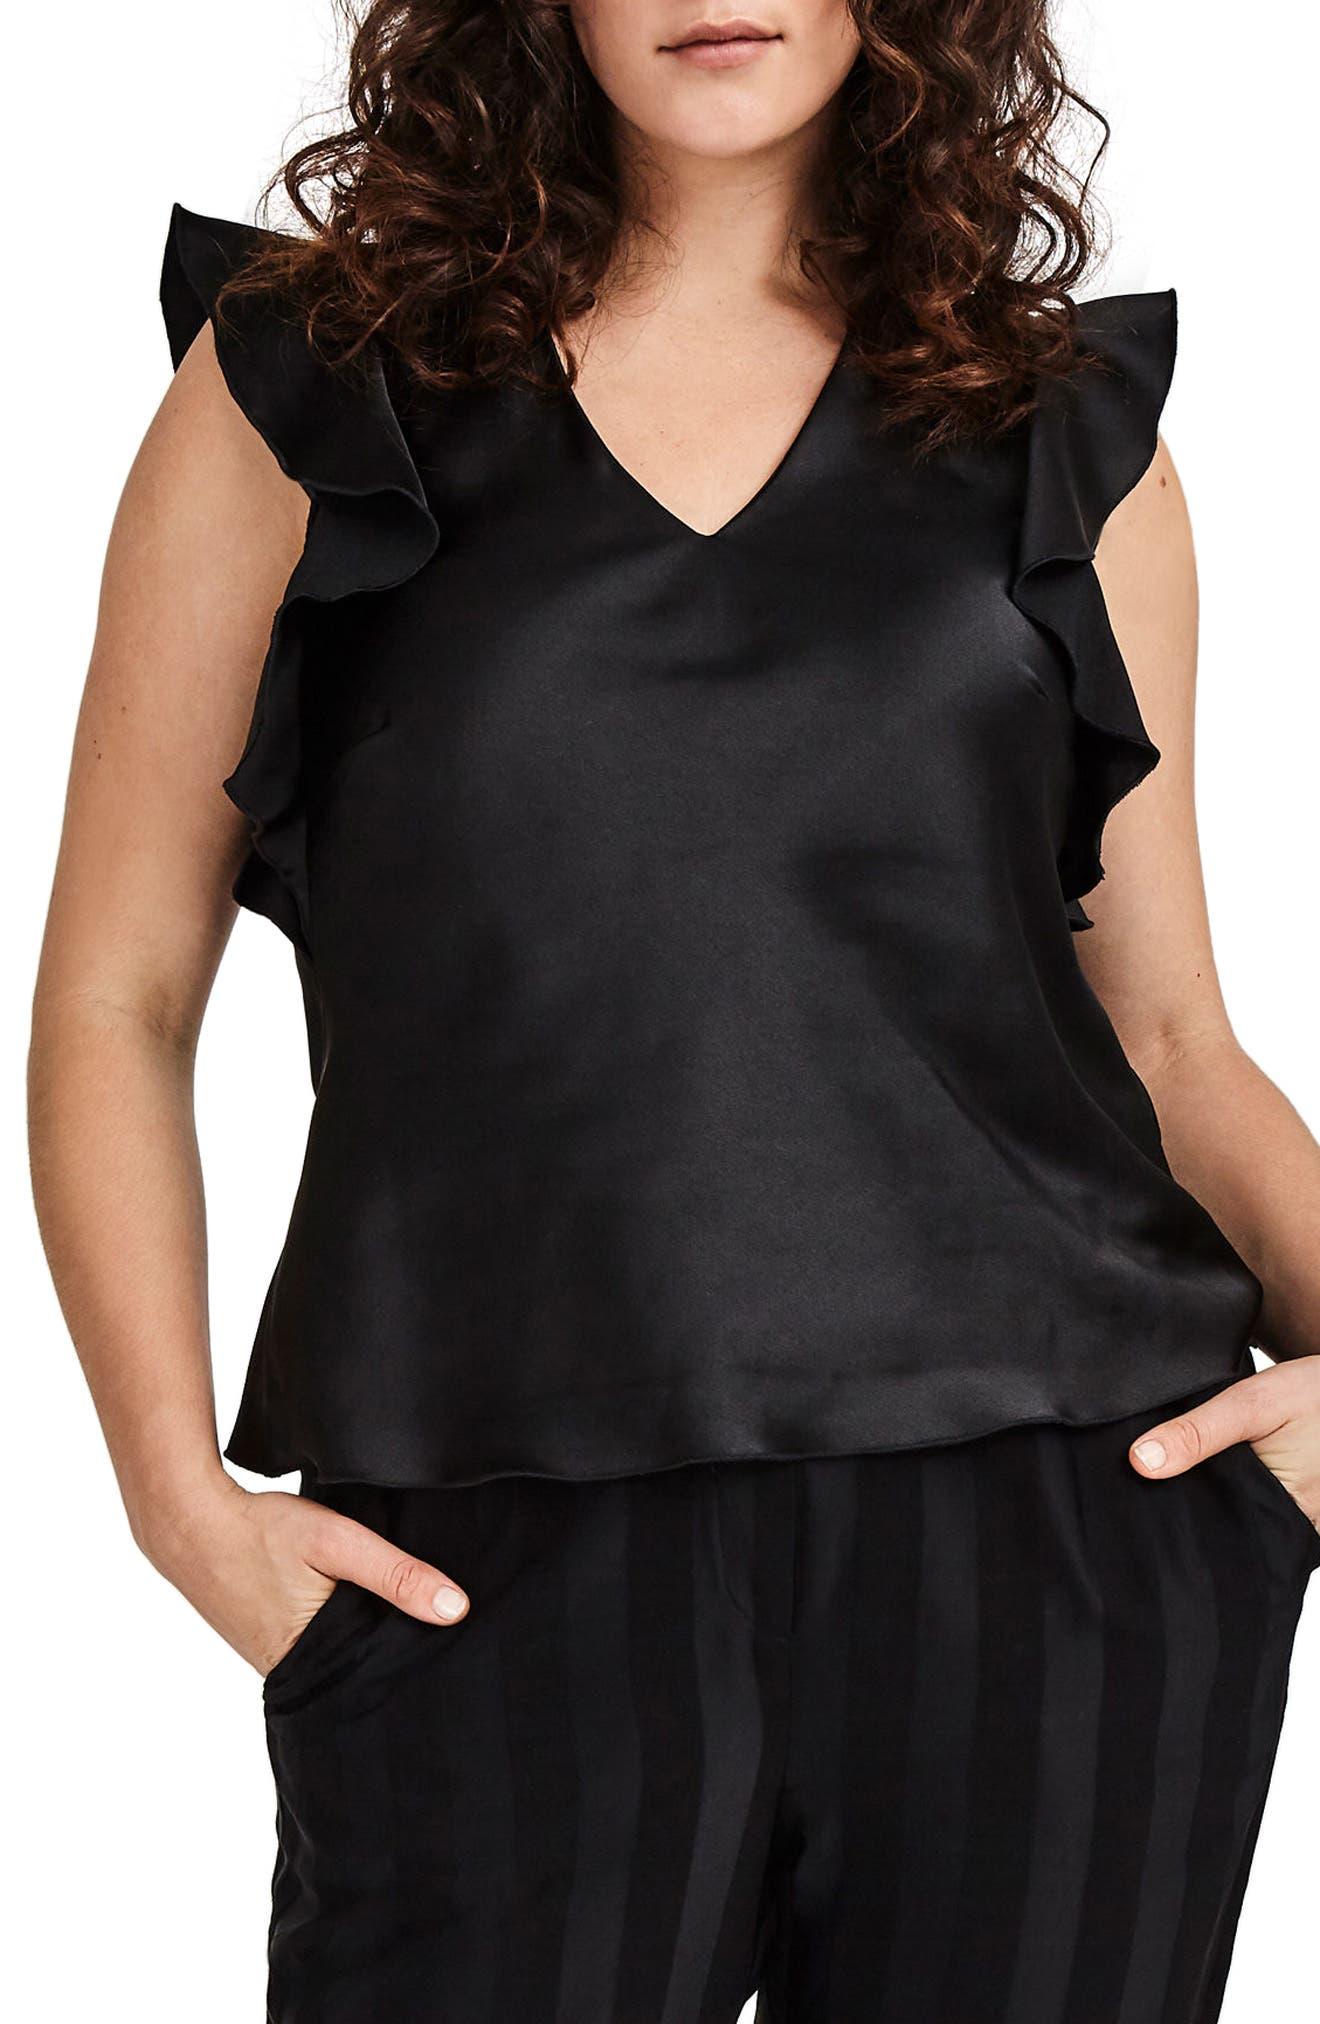 ELVI Black Satin Ruffle Top (Plus Size)